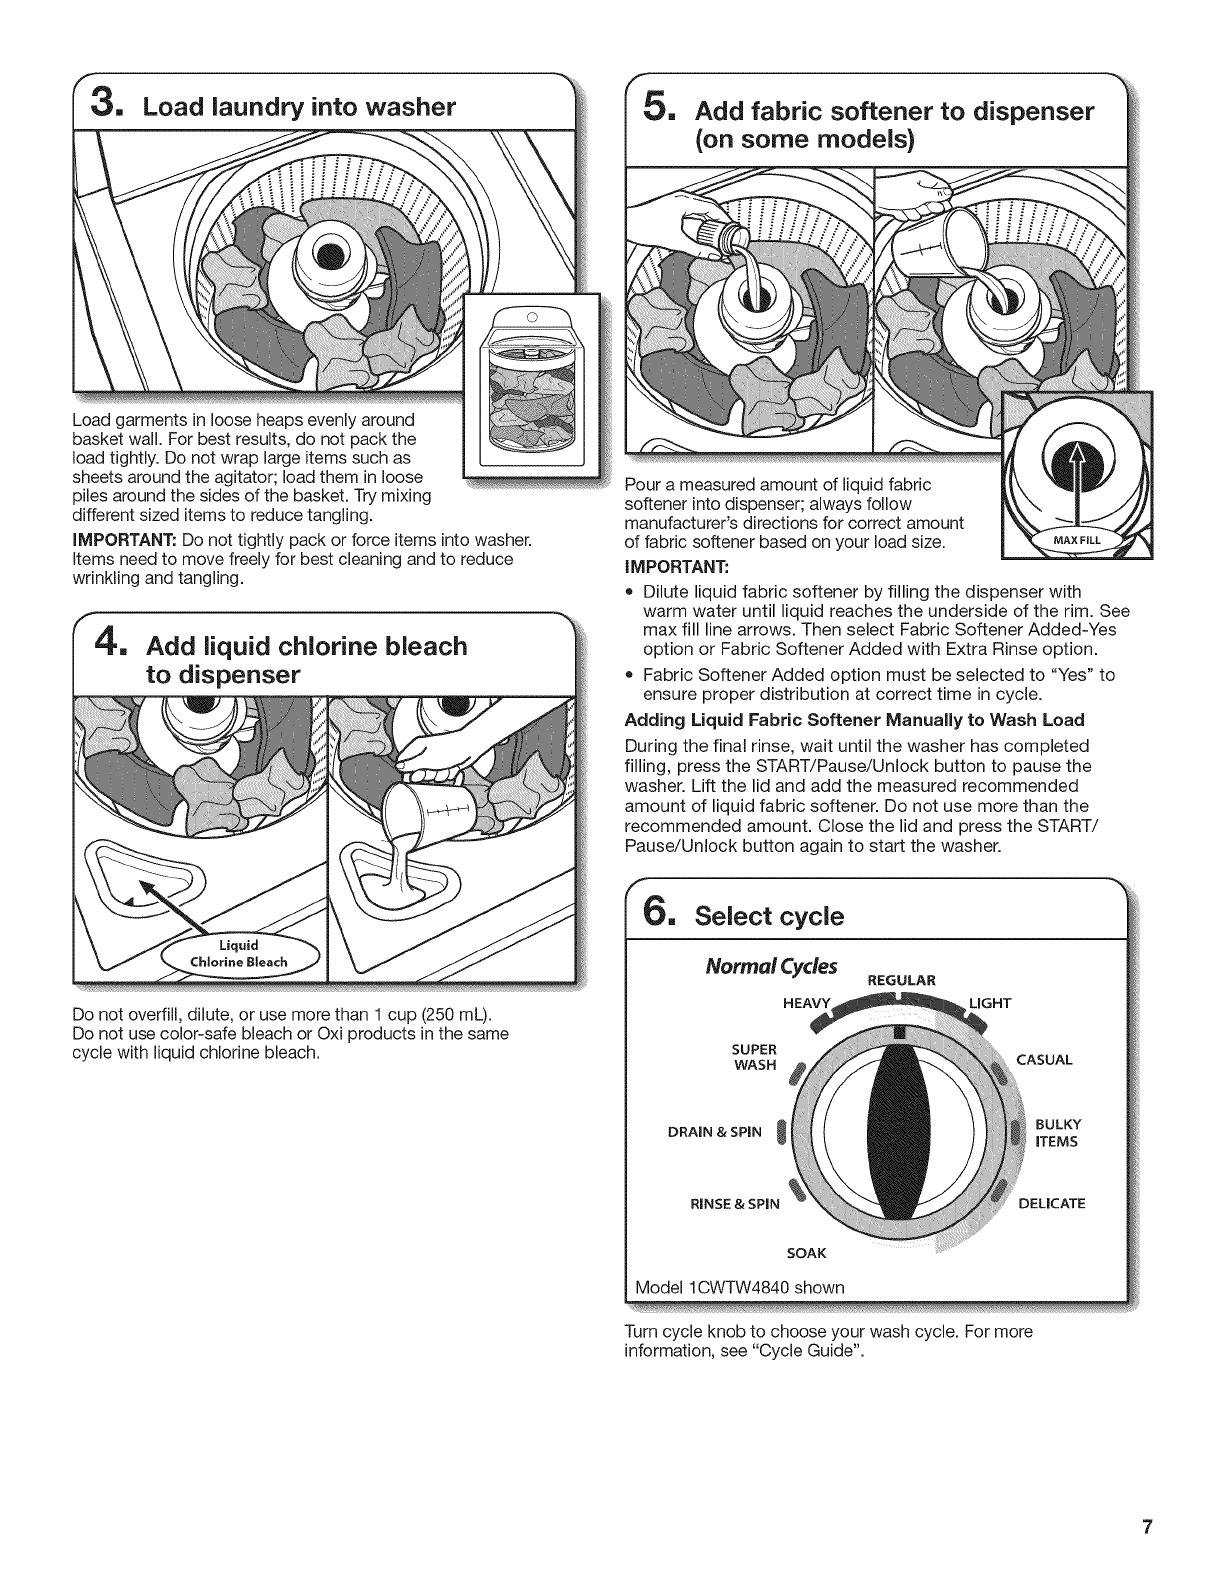 Whirlpool 1CWTW4800YQ2 1510380L User Manual WASHER Manuals